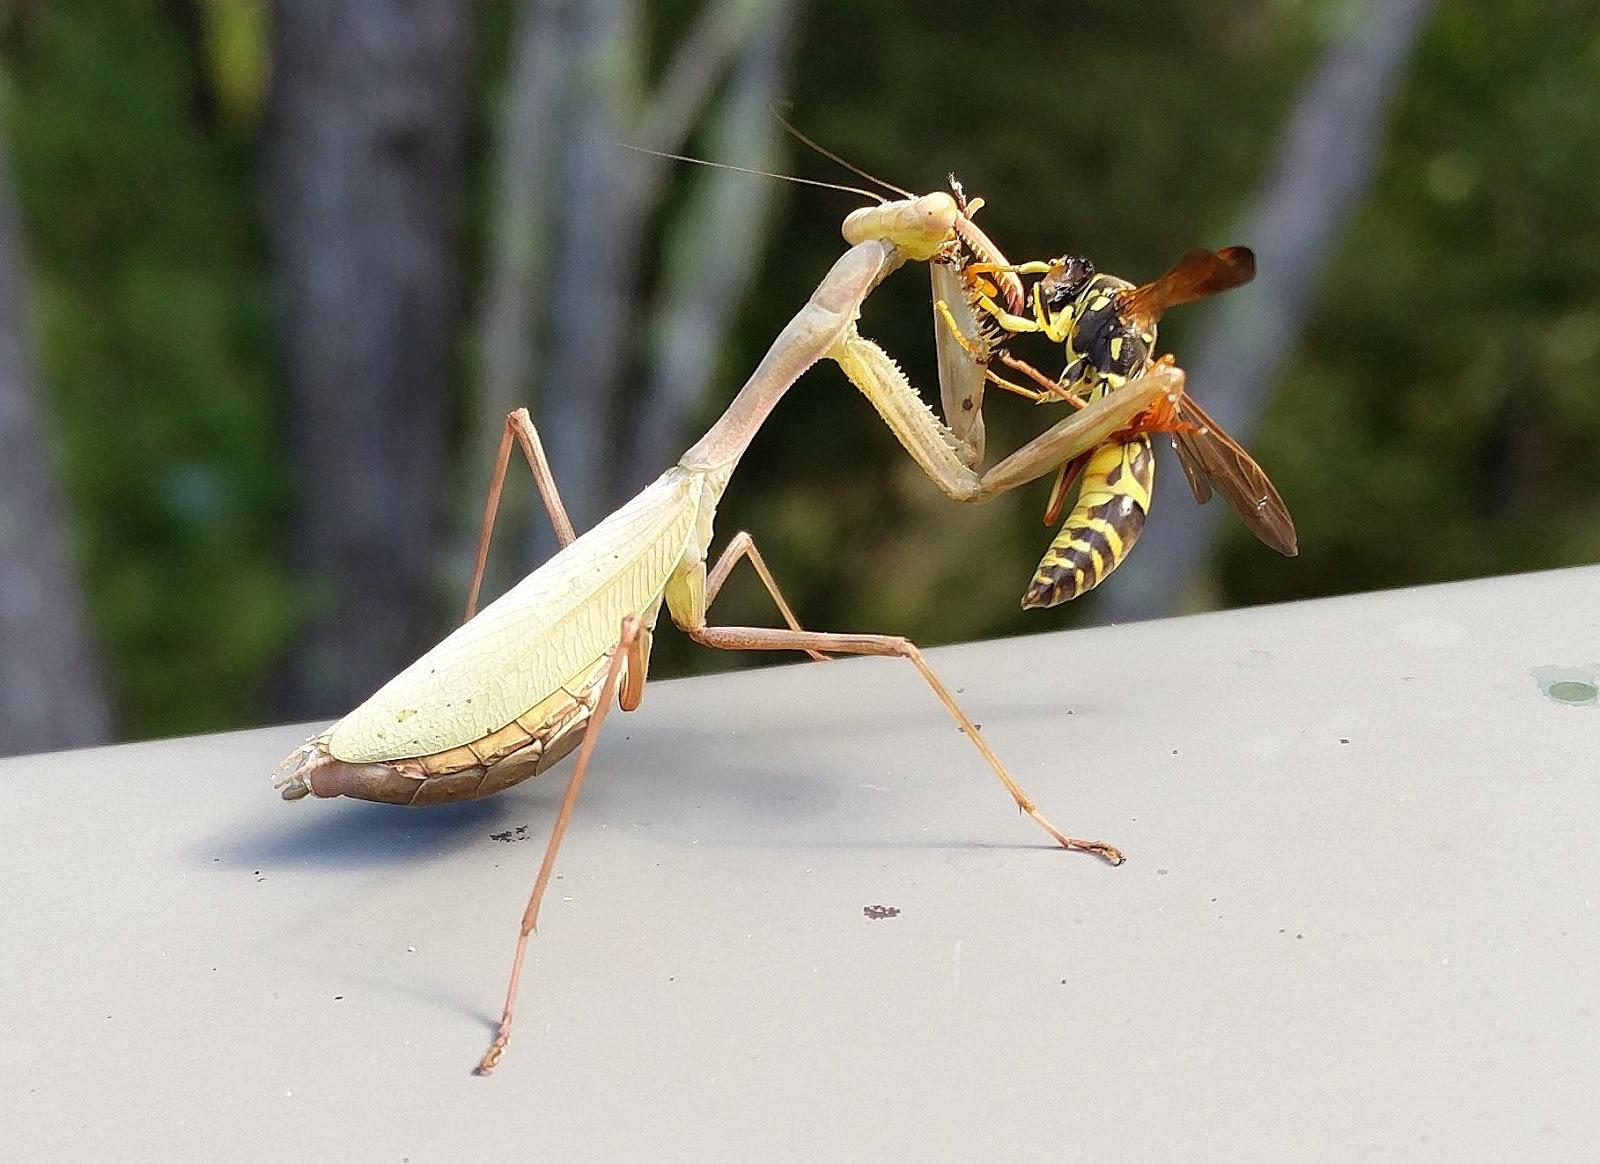 Hornet Vs Praying Mantis The Riverbank N...